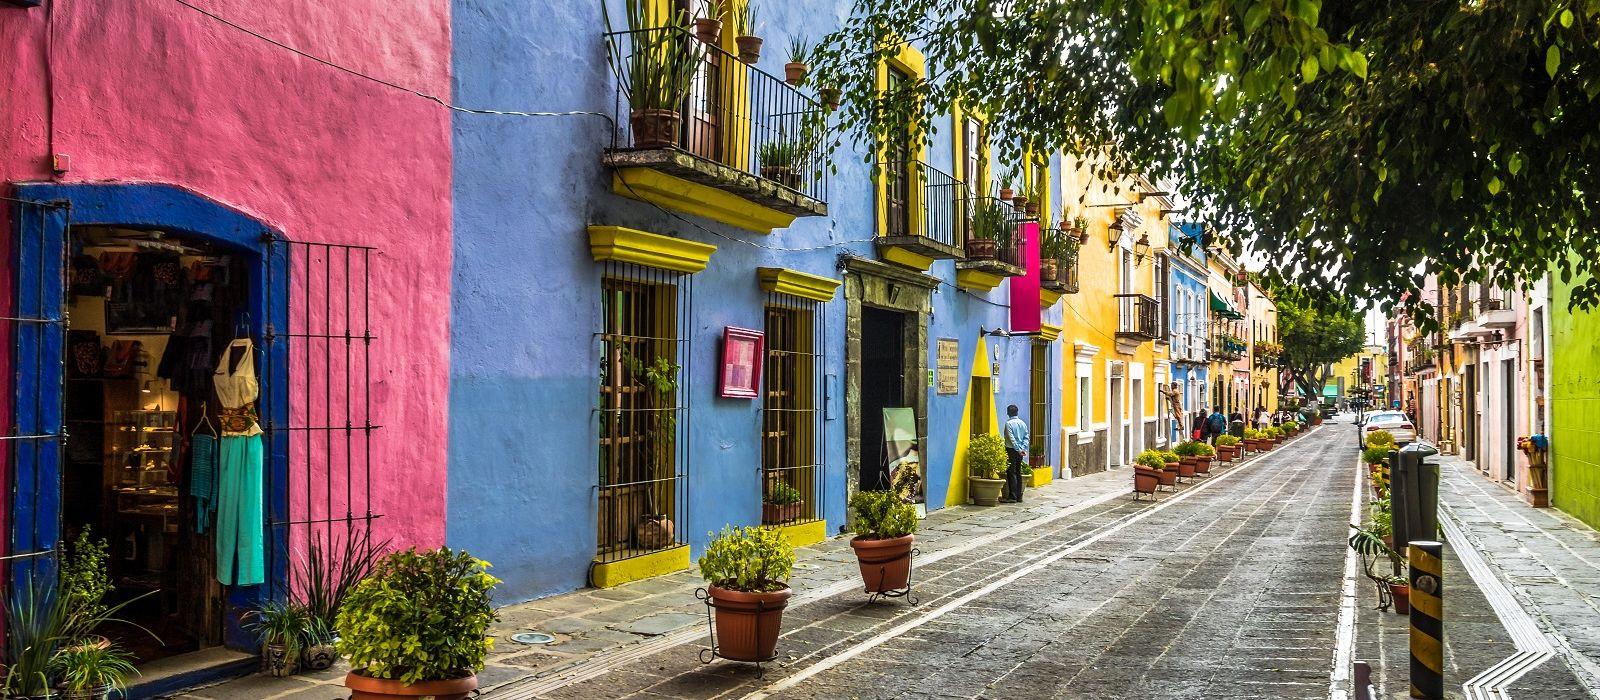 Große Tour durch Mexiko Urlaub 2